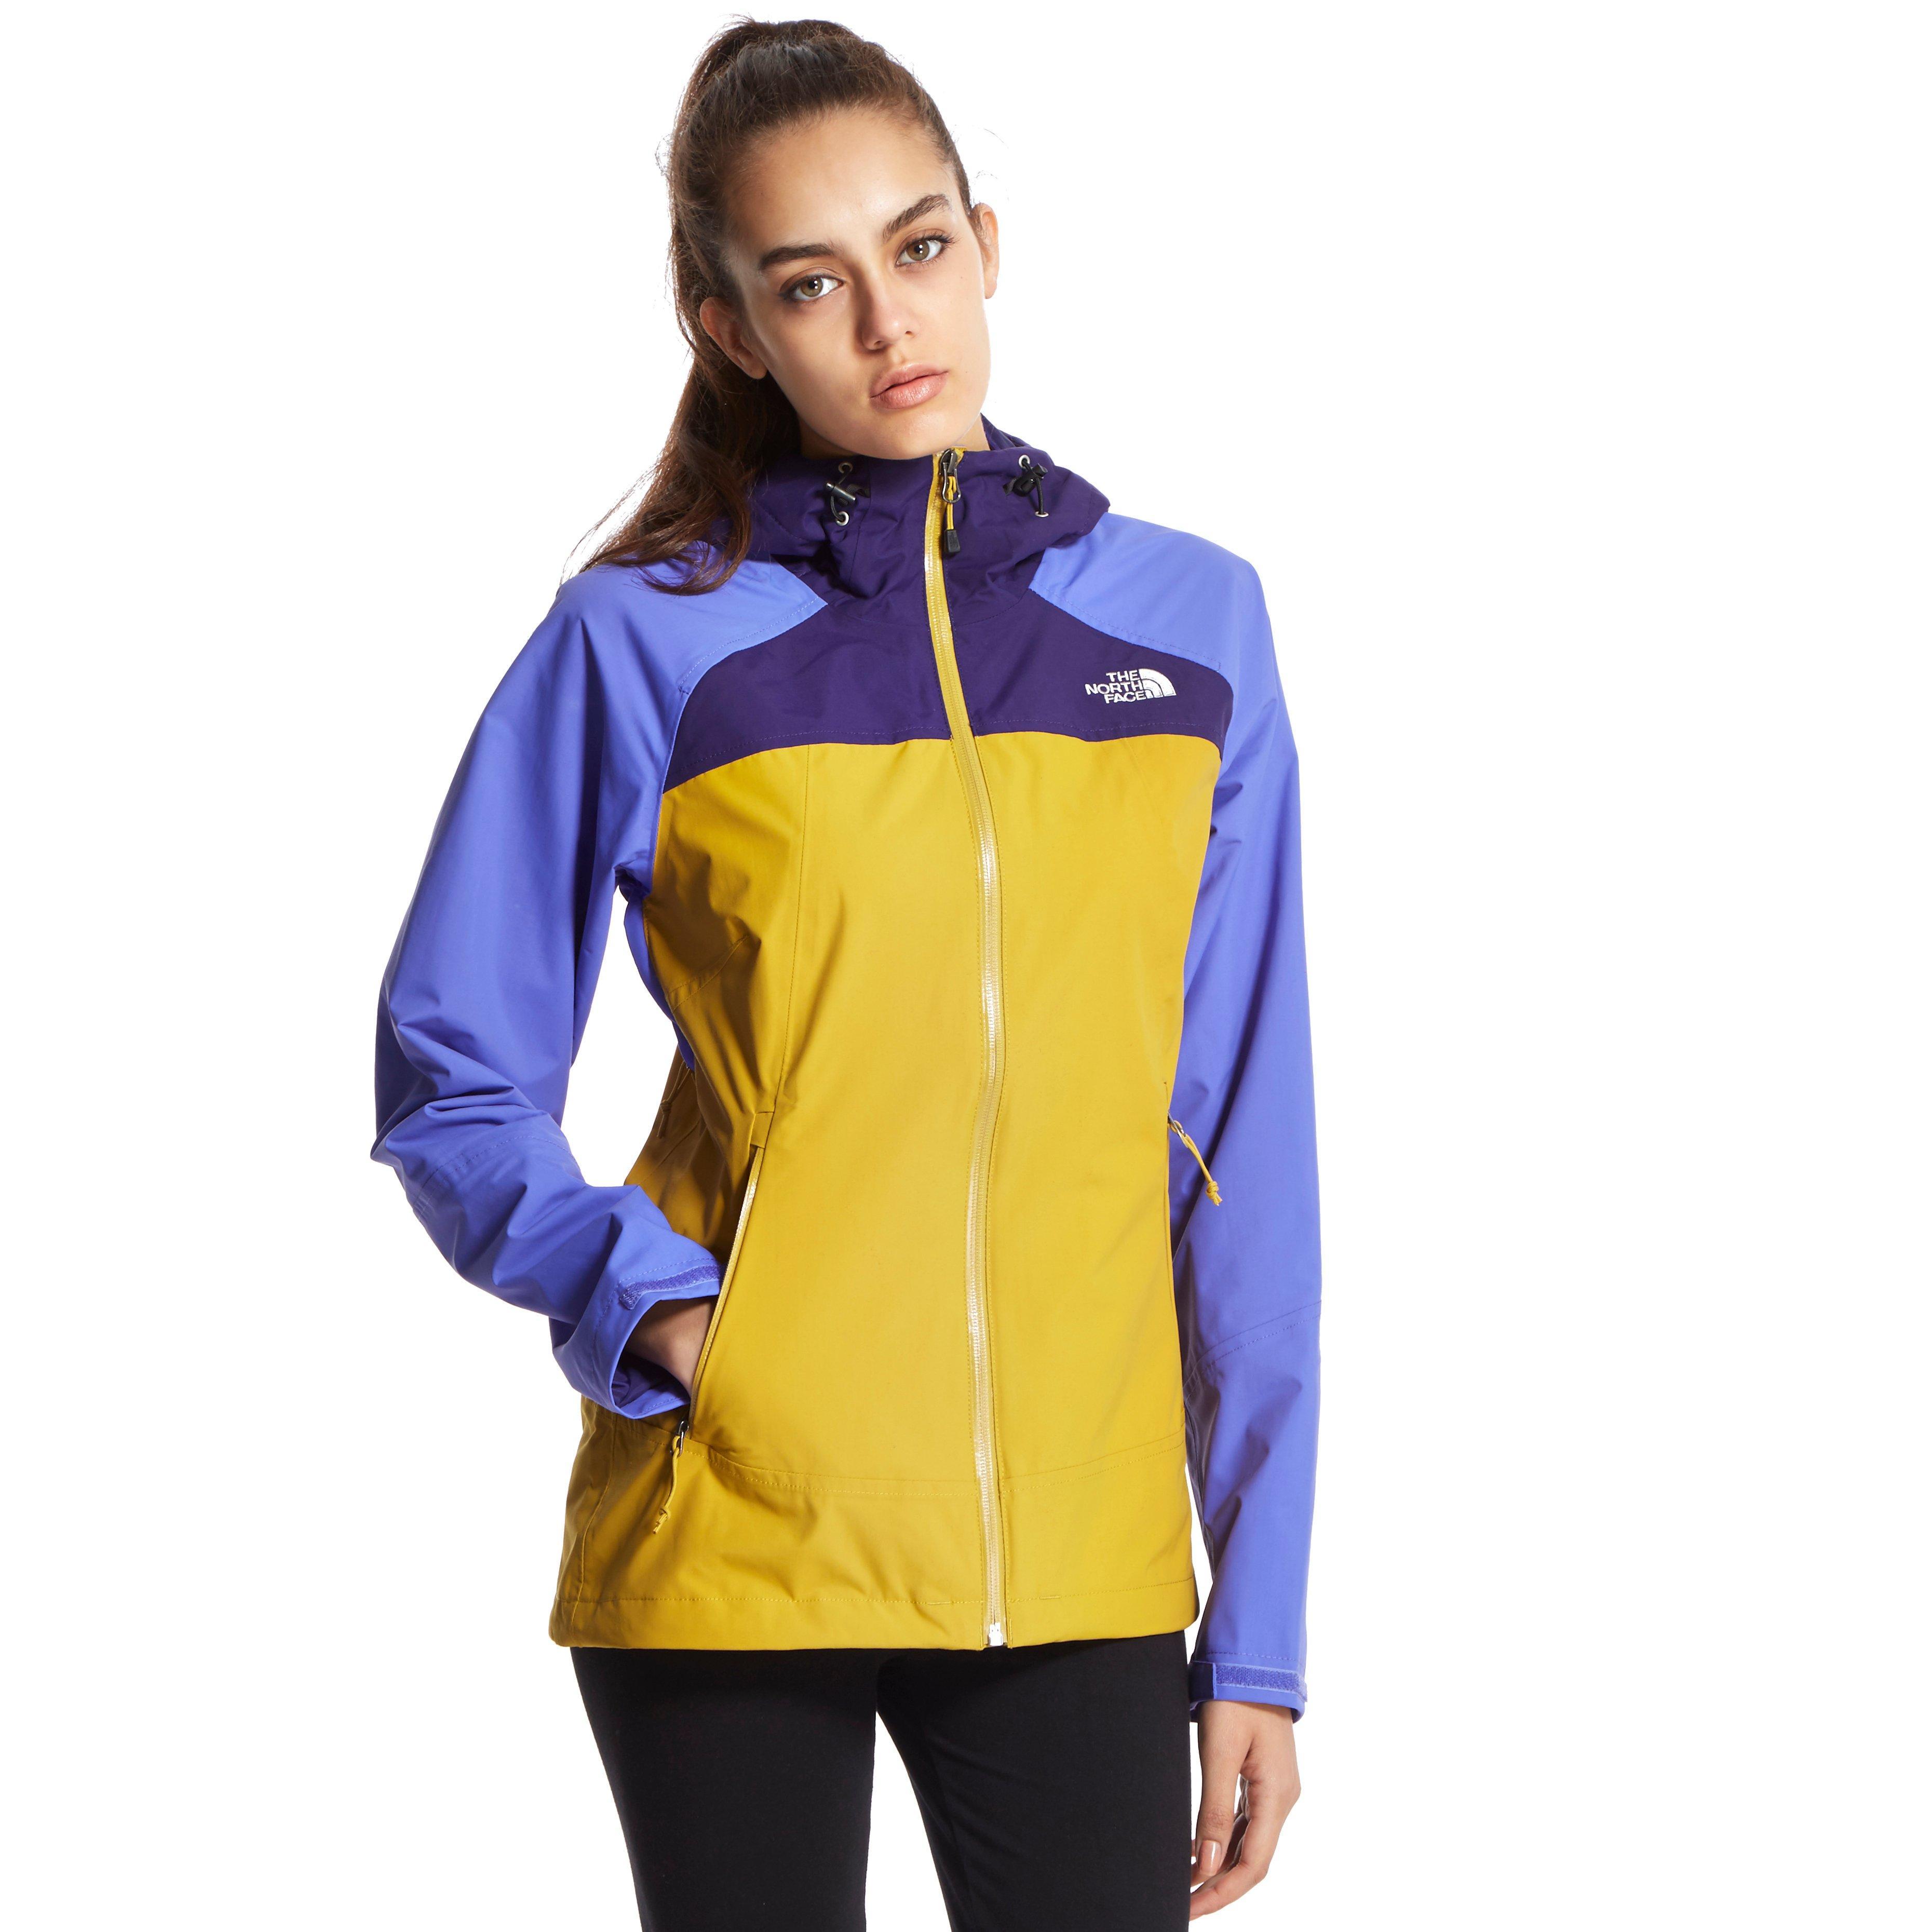 8f452b1f071 the north face women s stratos jacket hardshelljacke